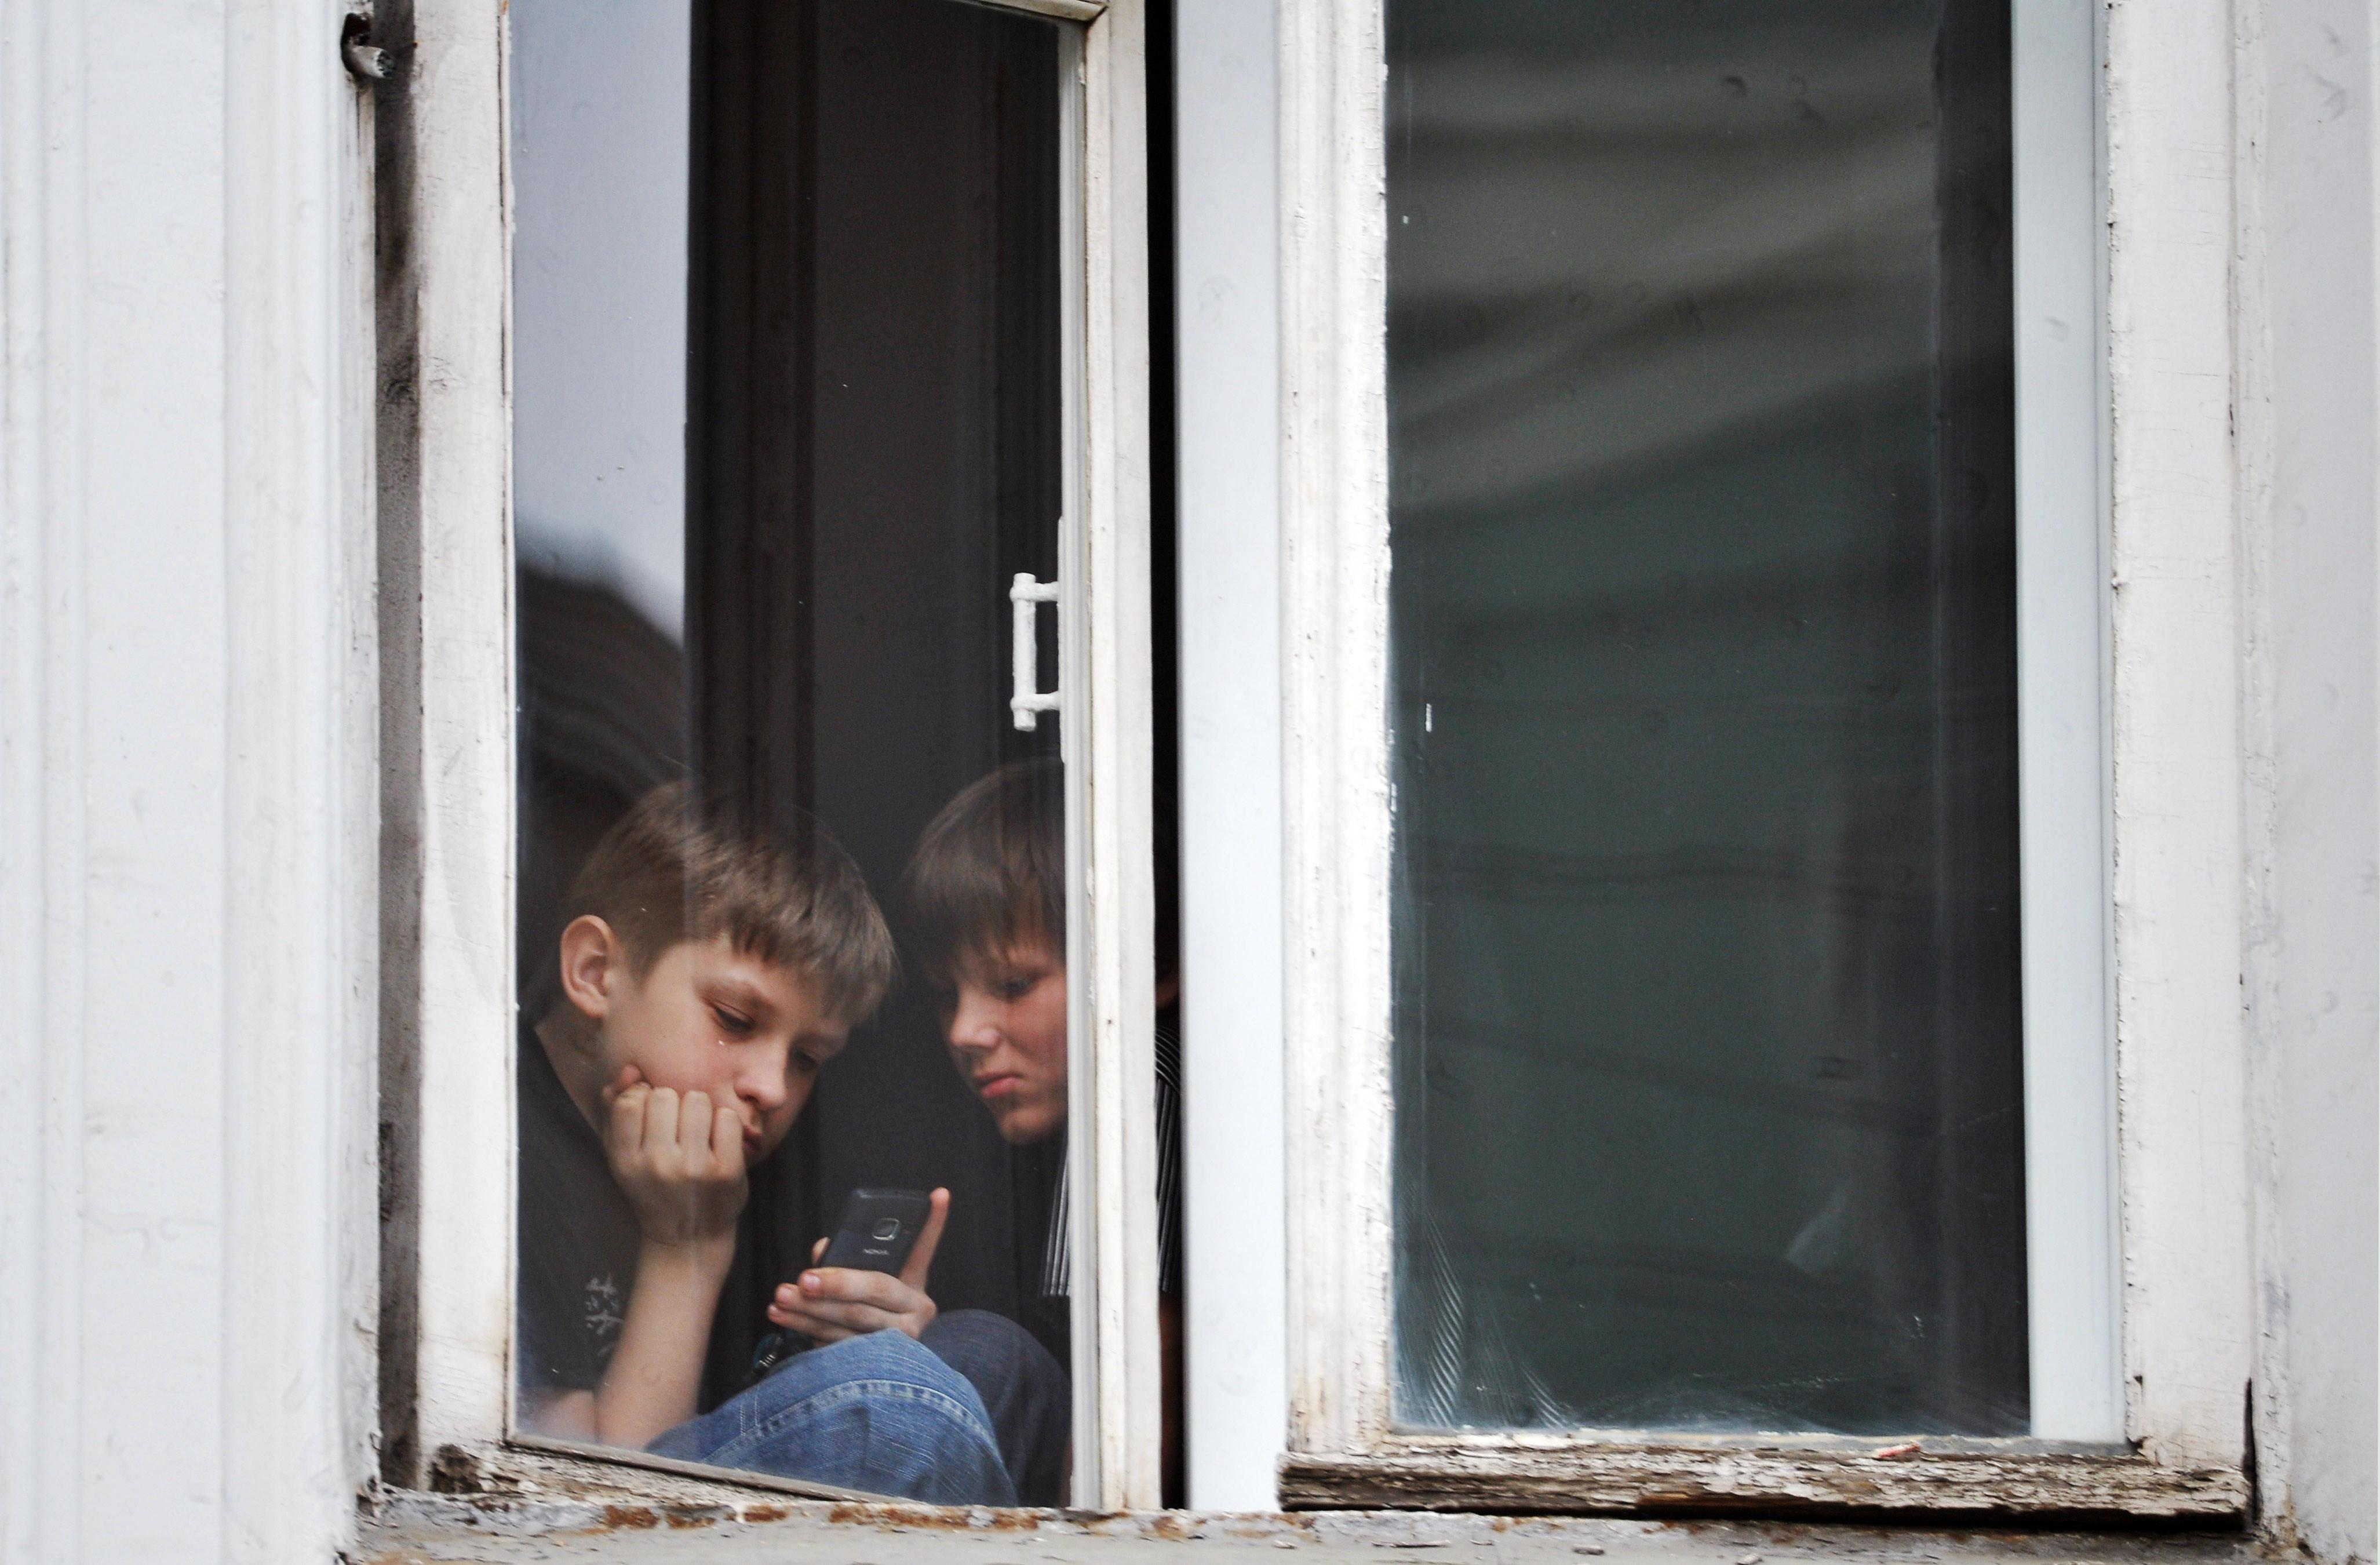 <p>Фото: &copy; РИА Новости / Владимир Астапкович</p>